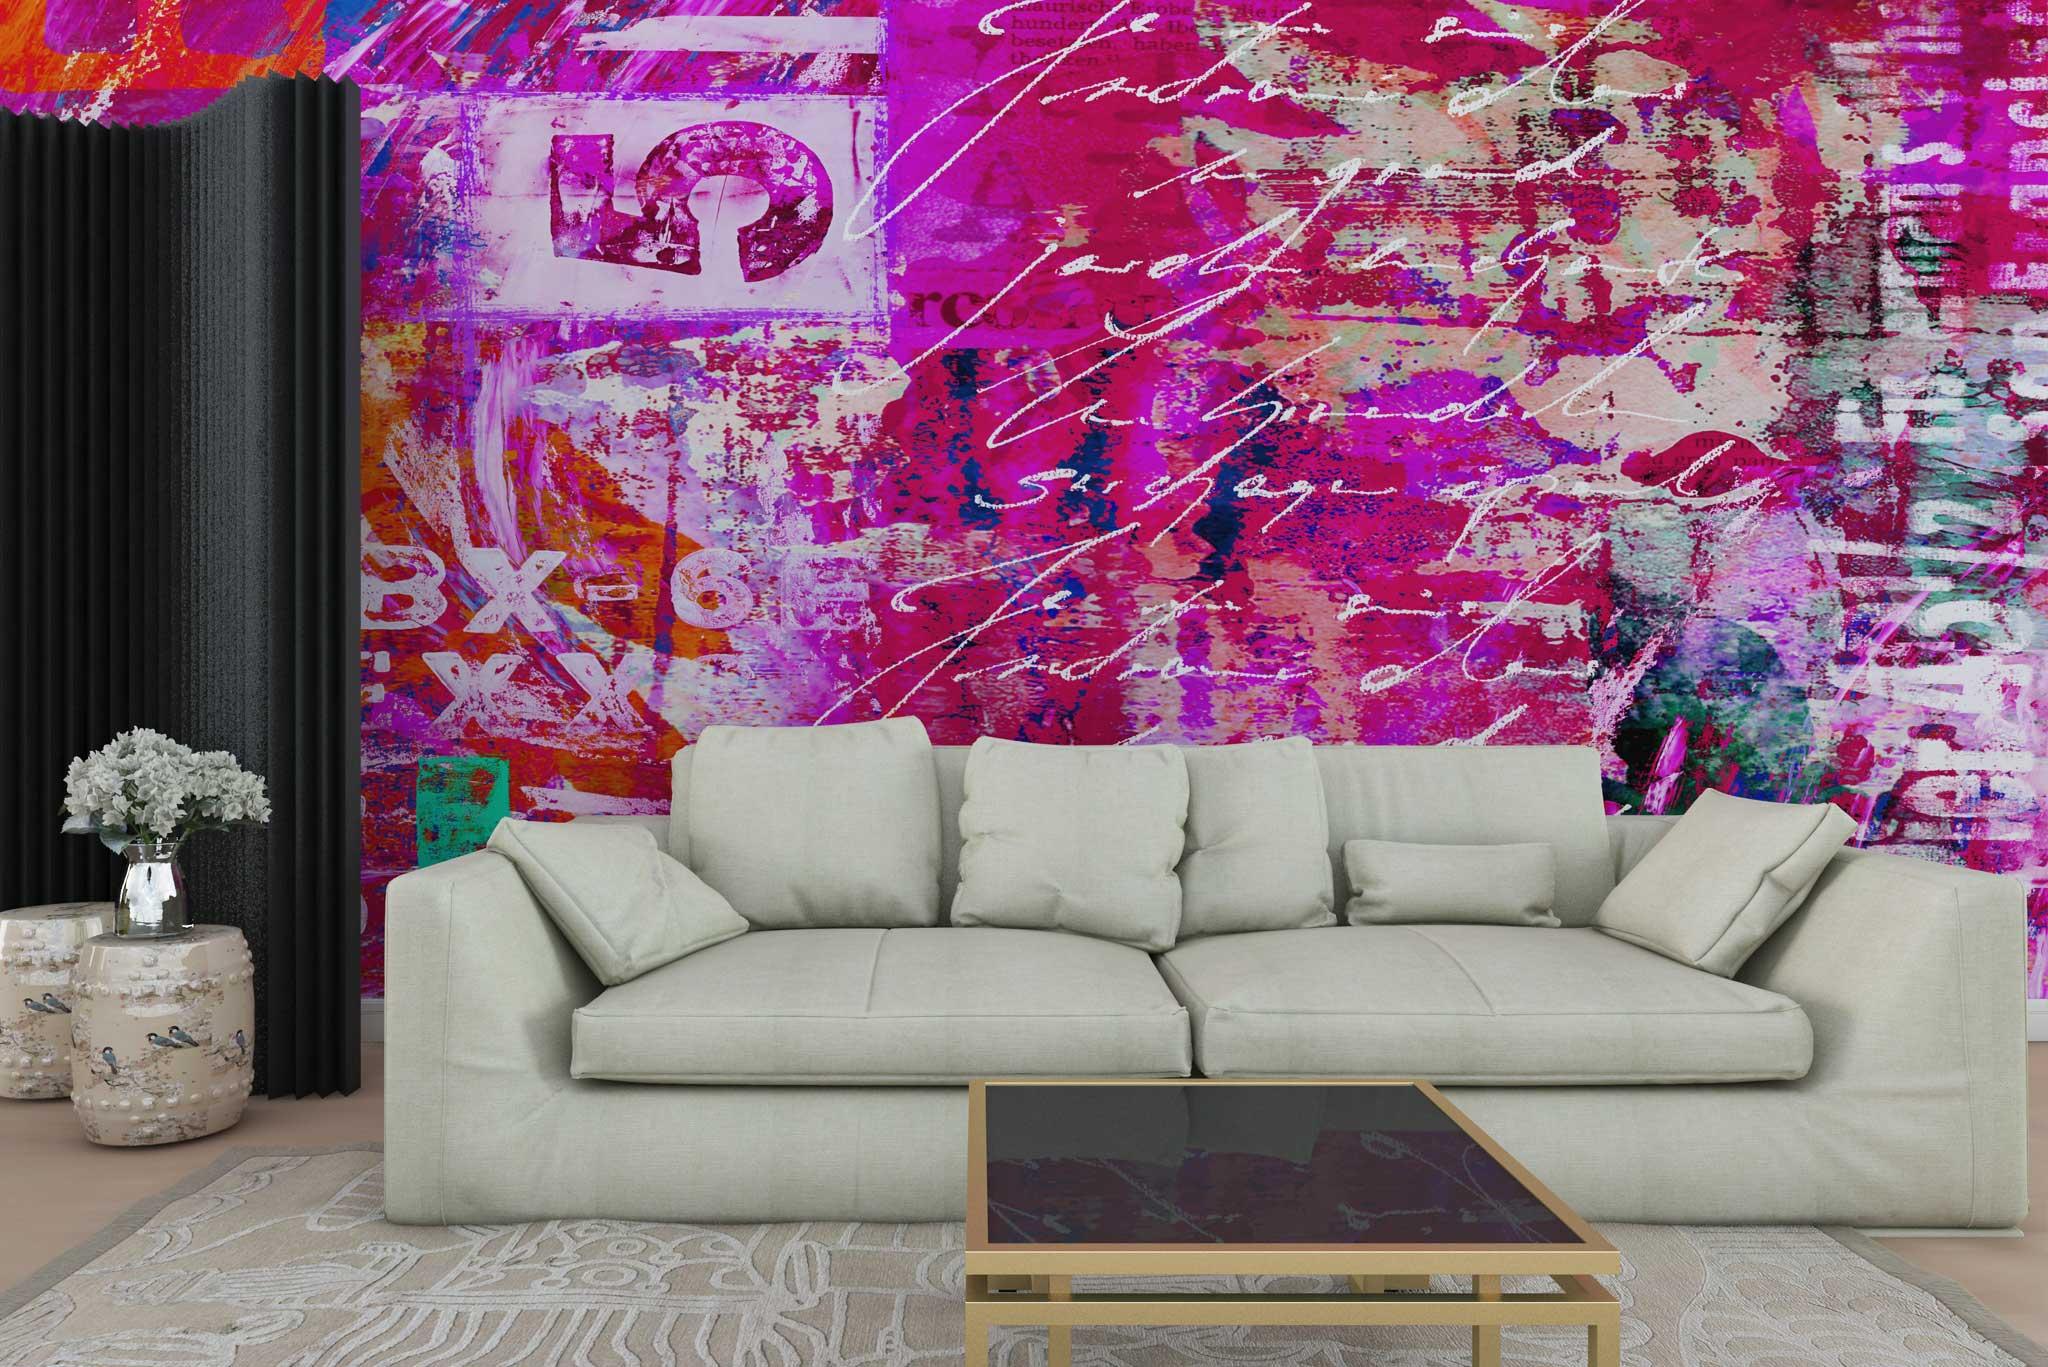 tapet-fototapet-personalizat-comanda-bucuresti-pictura-abstracta-roz-litere-perete-lux-special